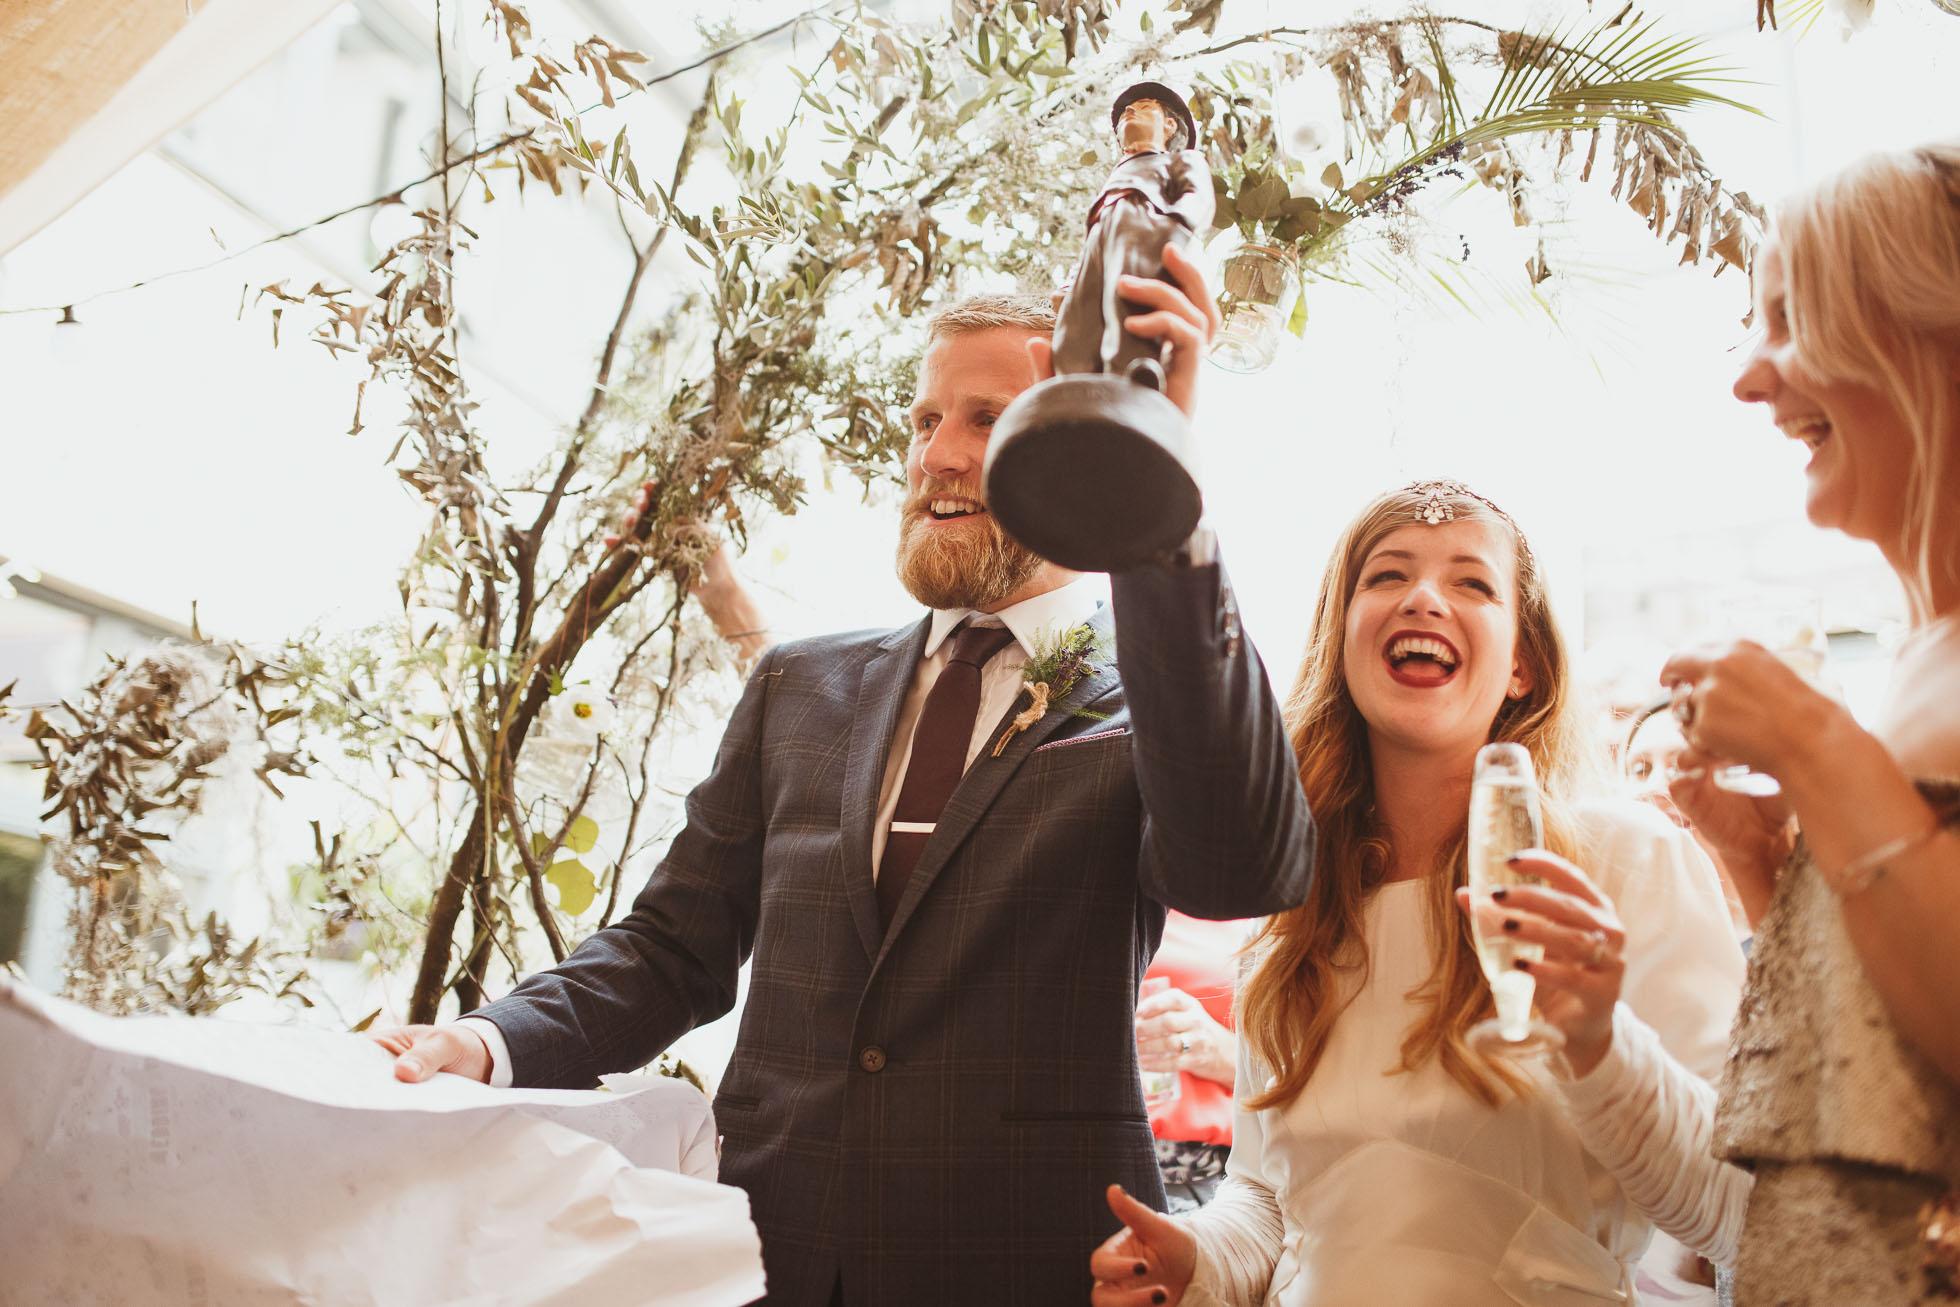 sheffield-botanical-gardens-wedding-photographer-77.jpg